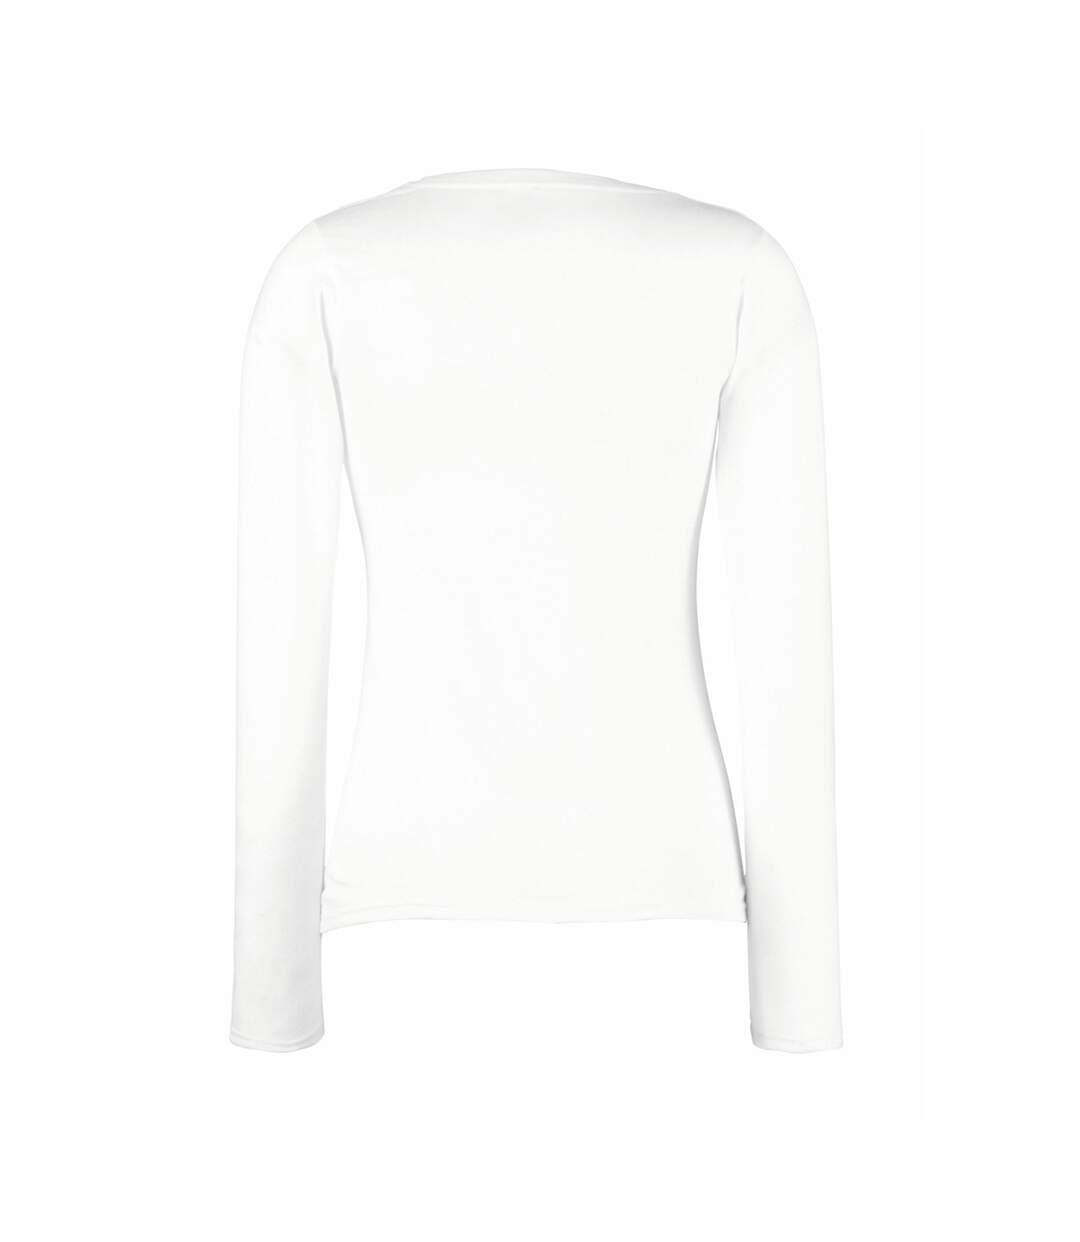 Fruit Of The Loom - T-Shirt À Manches Longues - Femme (Blanc) - UTBC1362